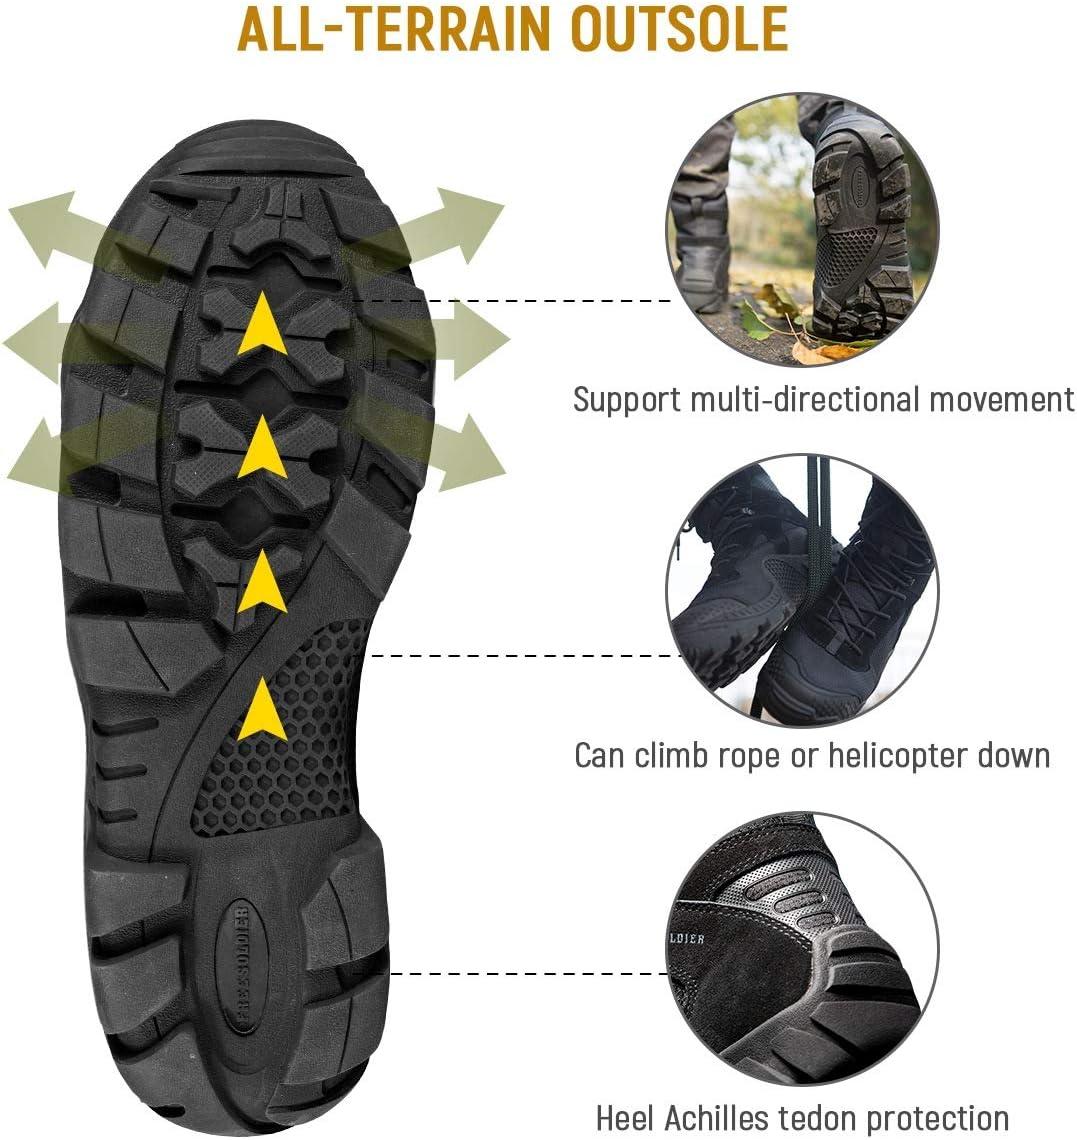 Armee Training Jagen Combat FREE SOLDIER Stiefel Herren Wanderstiefel Tactical Kampfstiefel Outdoor Military Boots M/änner Alles Gel/ände Schuhe zum Wandern Arbeiten